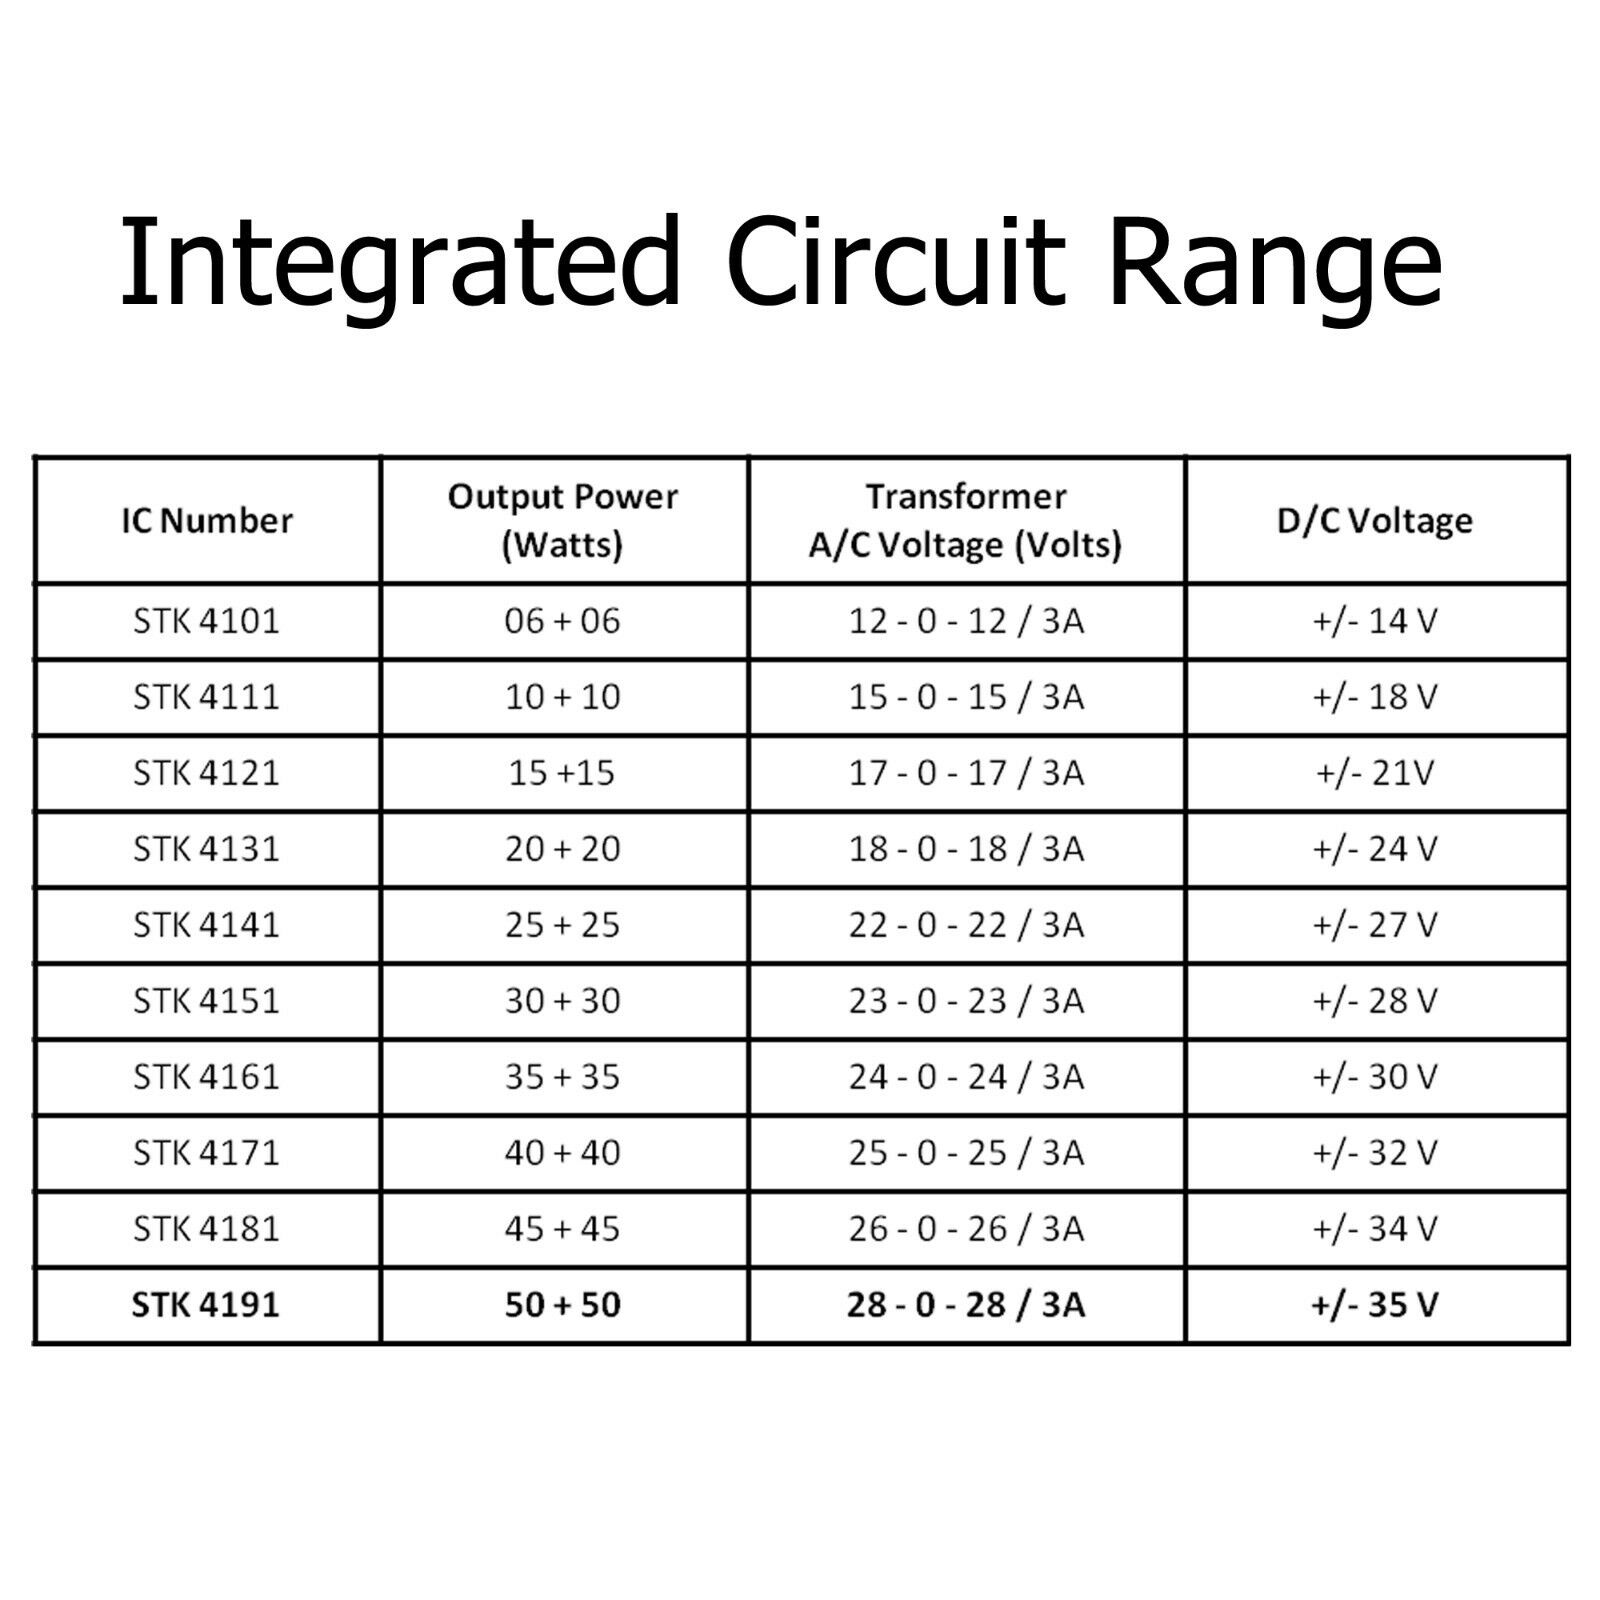 Stk 4191 100w Stereo Power Amplifier Diy Kit With Ne5532 Pre Amp Ic Tone Ctrl Pcb Ebay